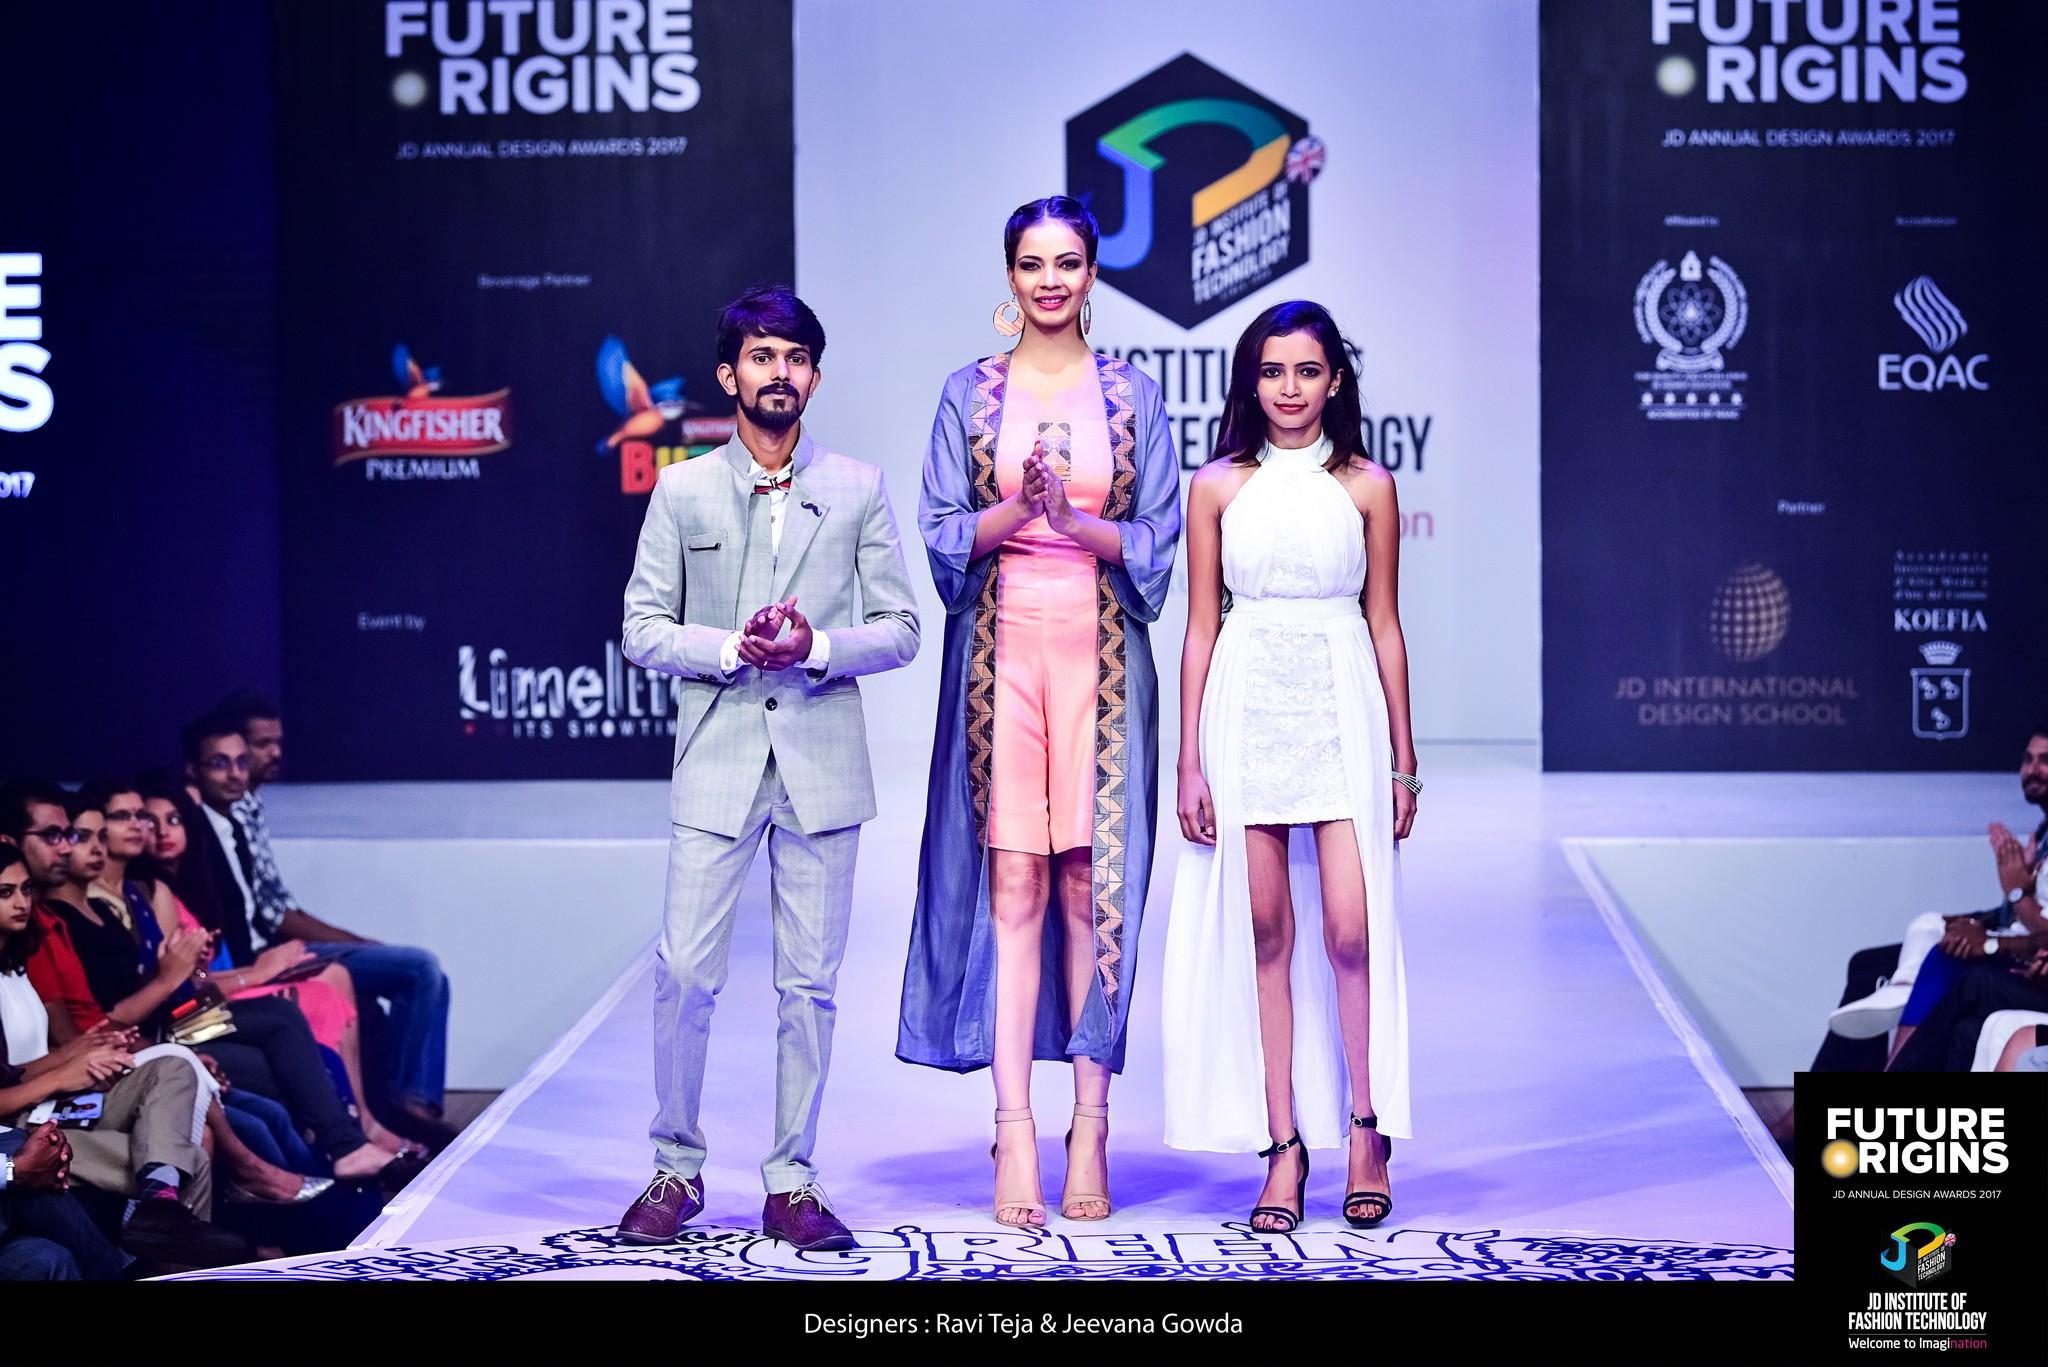 Calsada - Future Origin - JD Annual Design Awards 2017 | Photography : Jerin Nath (@jerin_nath) calsada - Calsada     Future Origin     JD Annual Design Awards 2017 6 - Calsada – Future Origin – JD Annual Design Awards 2017